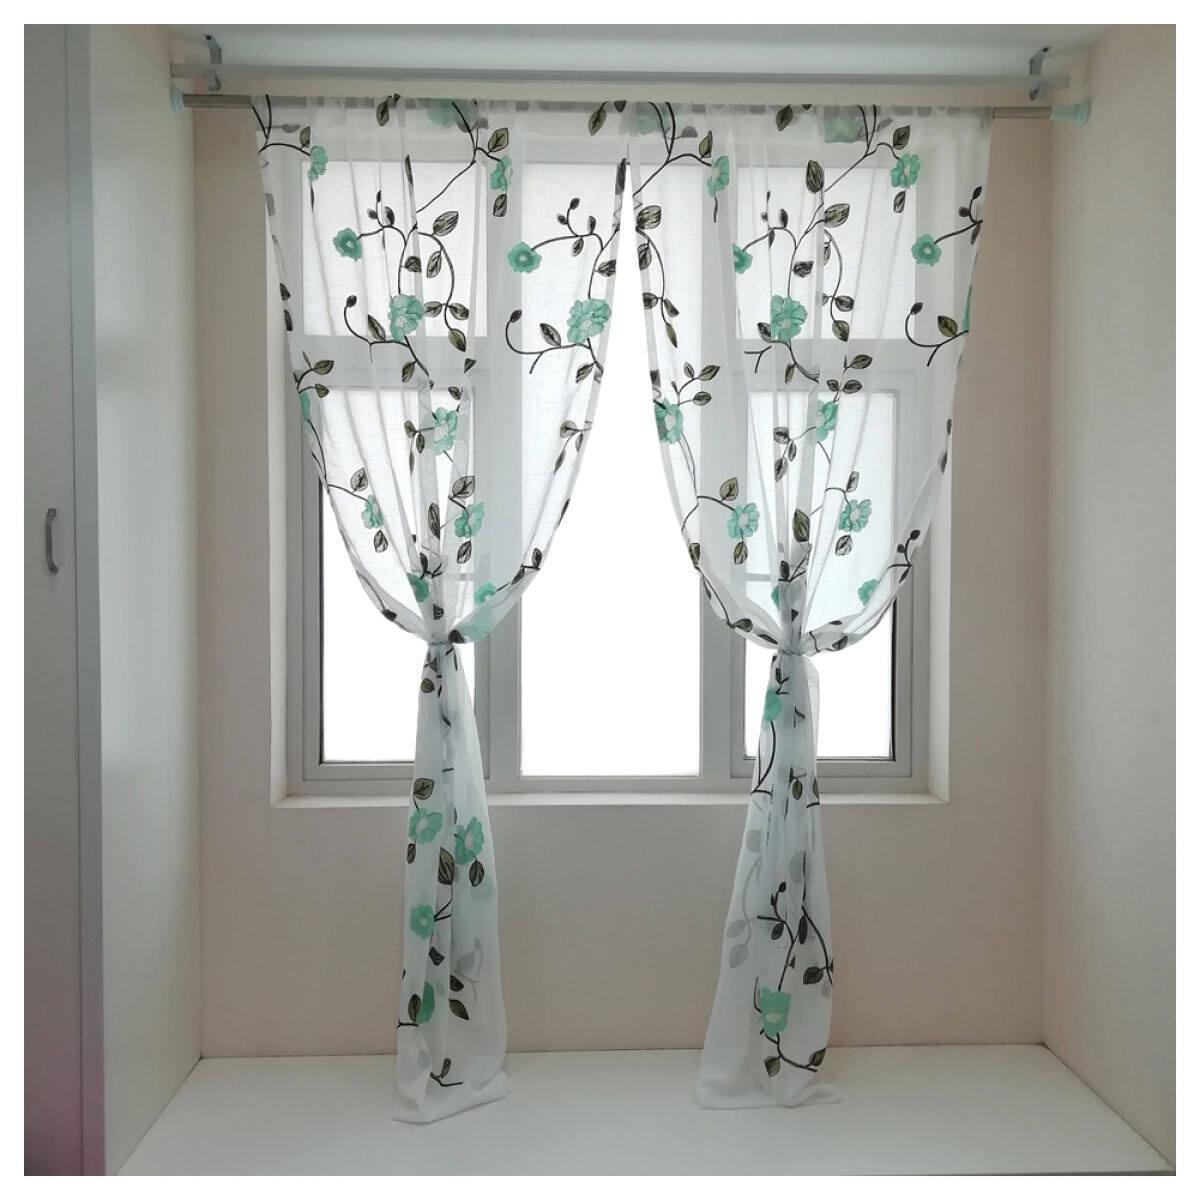 Blue Floral Embroidered Curtains For Living Room Pastoral Sheer Kitchen Window Drapes Langsir 1 Pc Rod Pocket Lazada